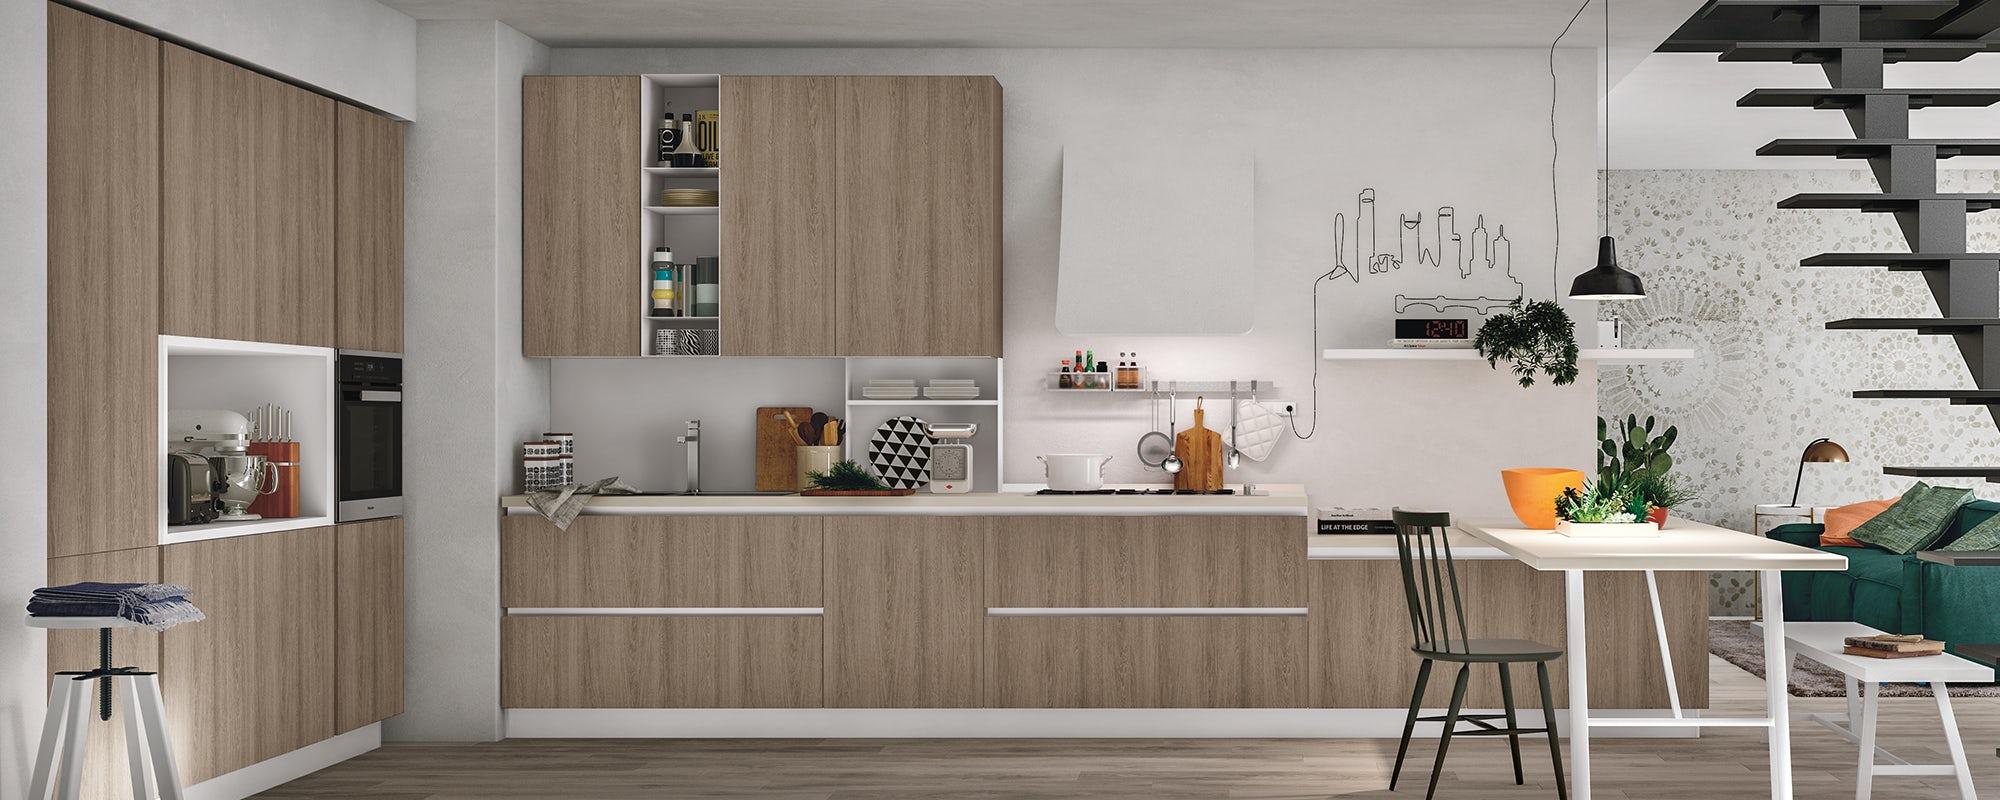 Cucina Stosa Replay Lecce